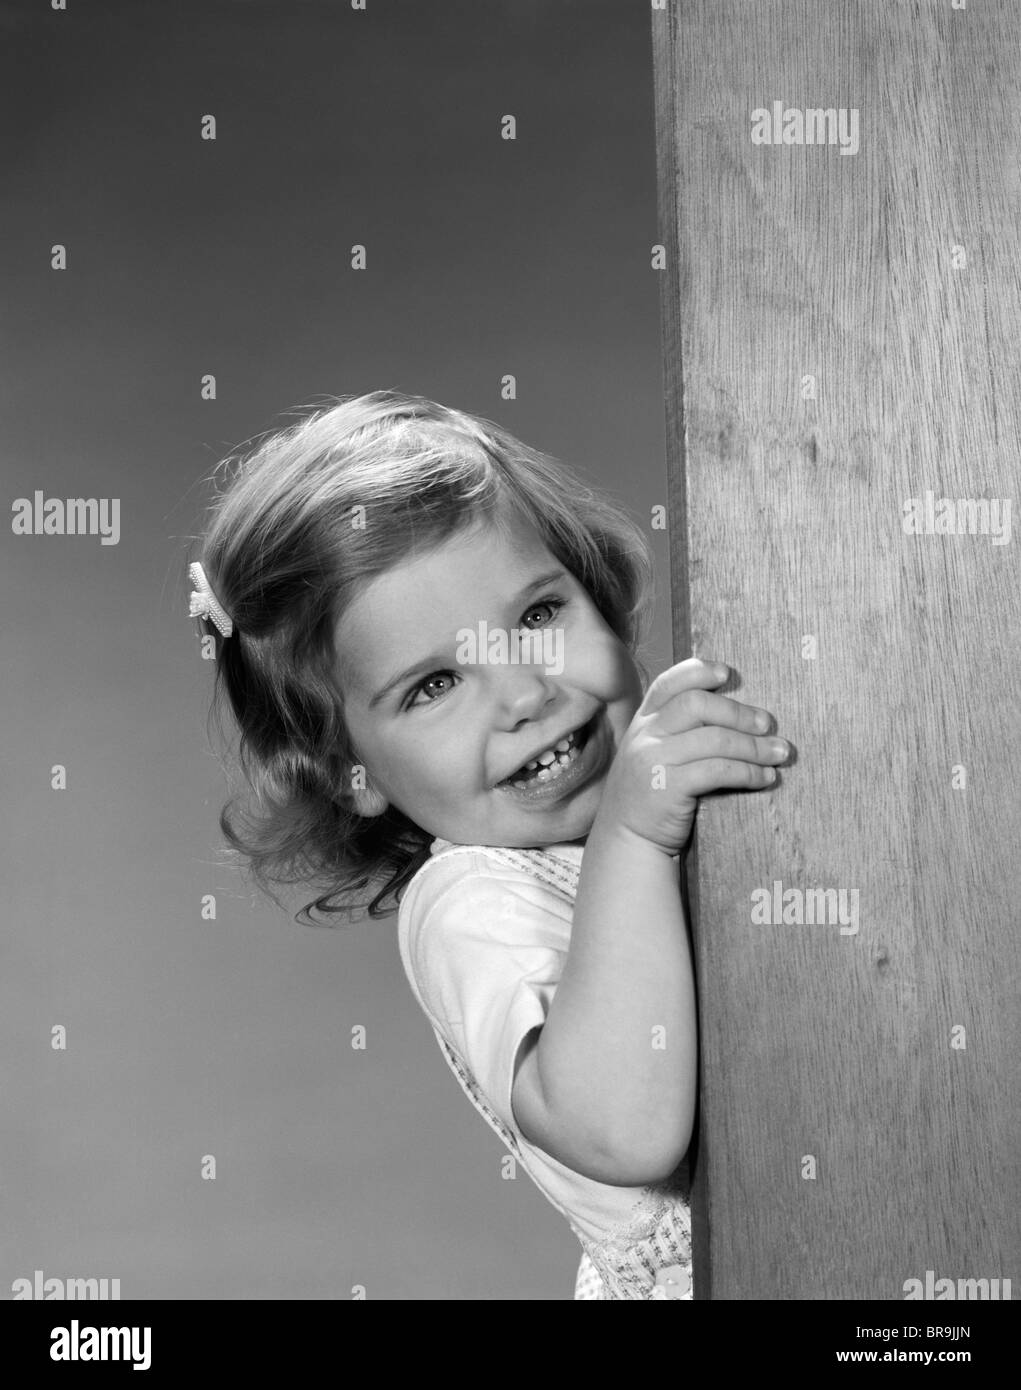 Little Black Kid In A Picture Peeking Around A Corner